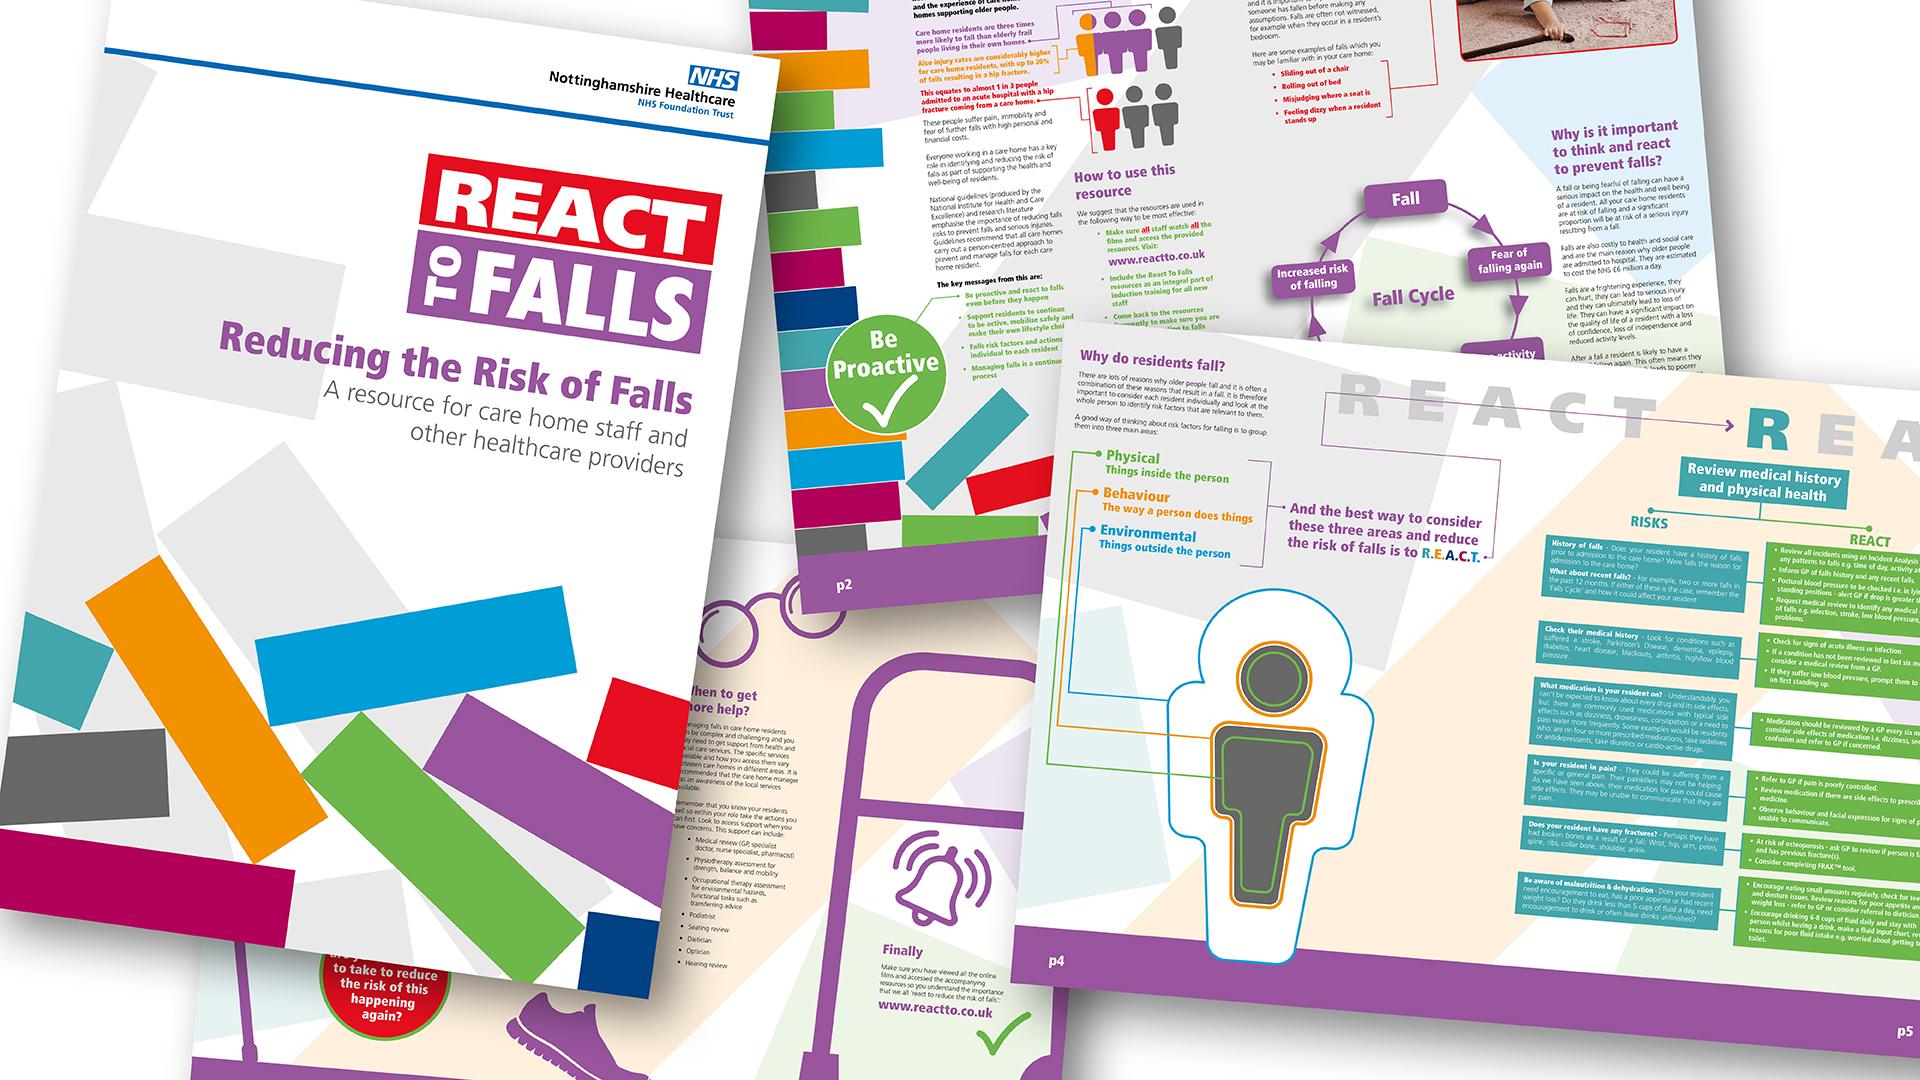 React to Falls